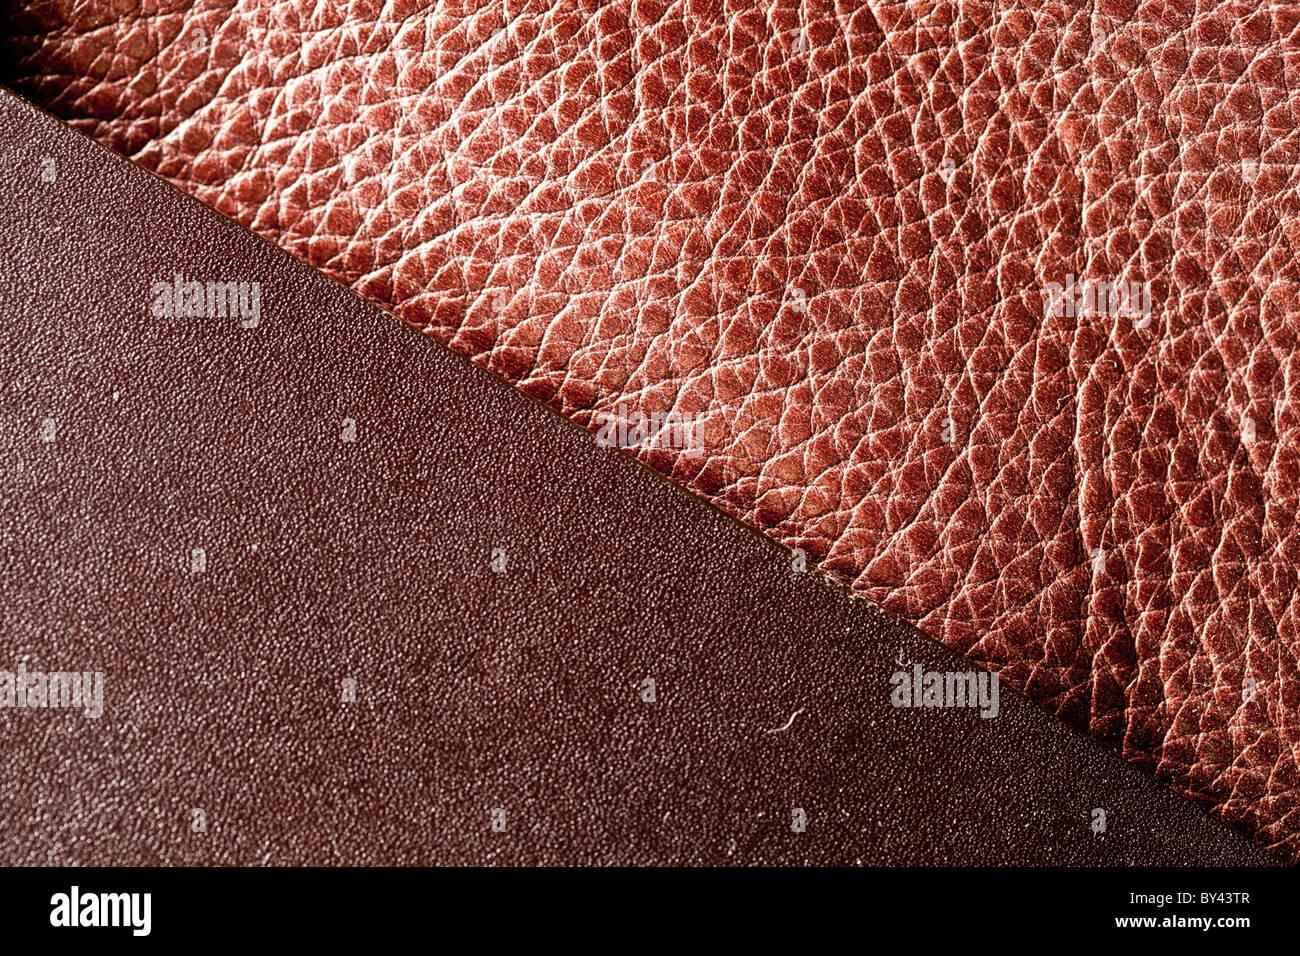 Imagen textura de piel marrón. Imagen De Stock